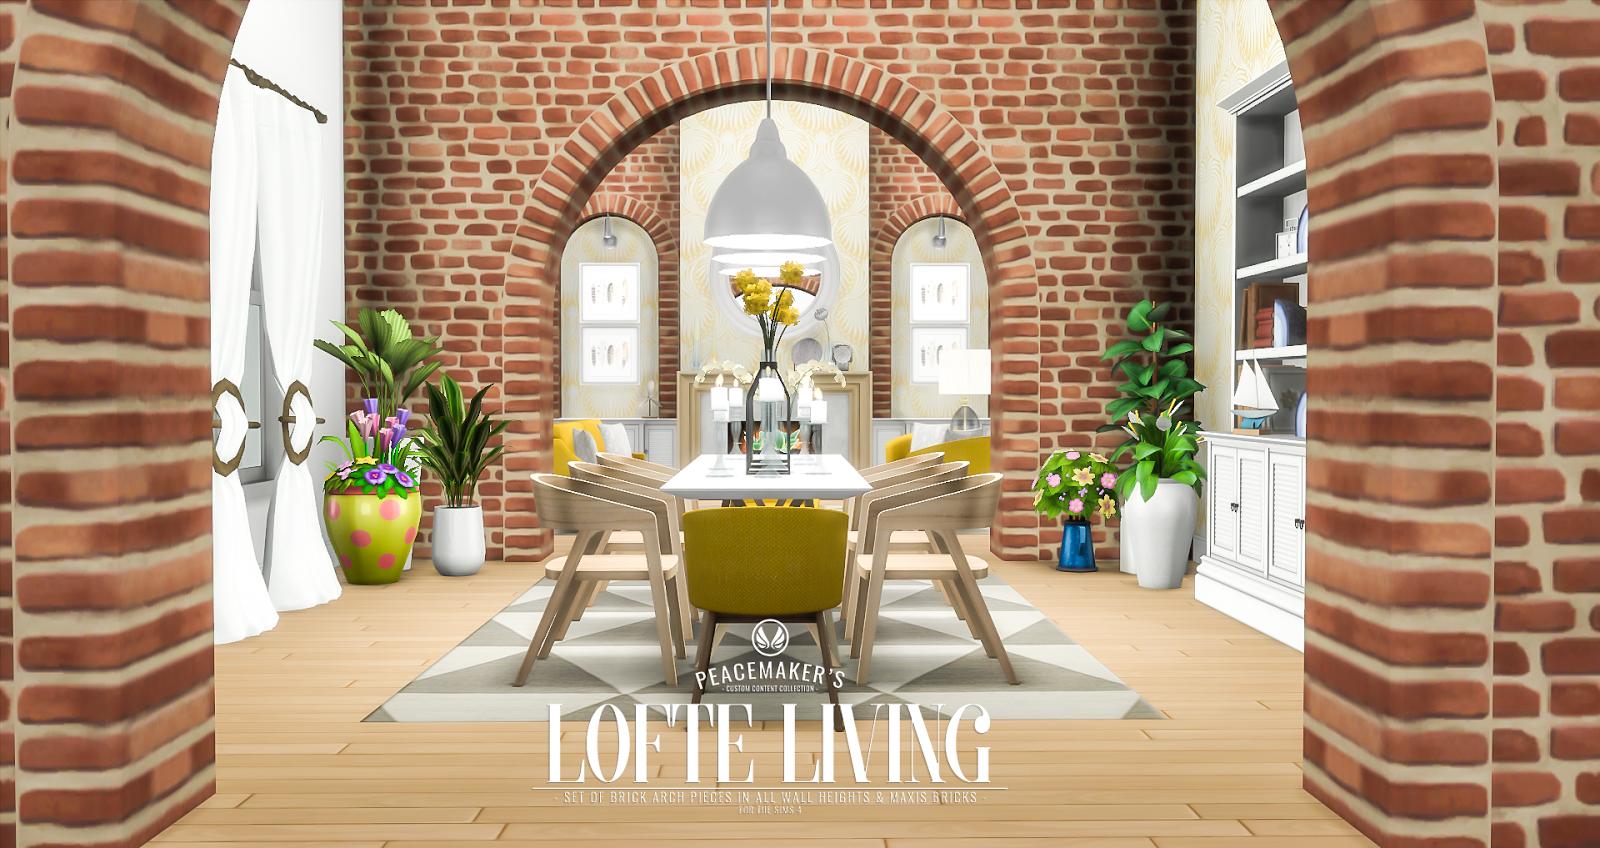 Simsational designs lofte living brick arch decor set for Archway decoration